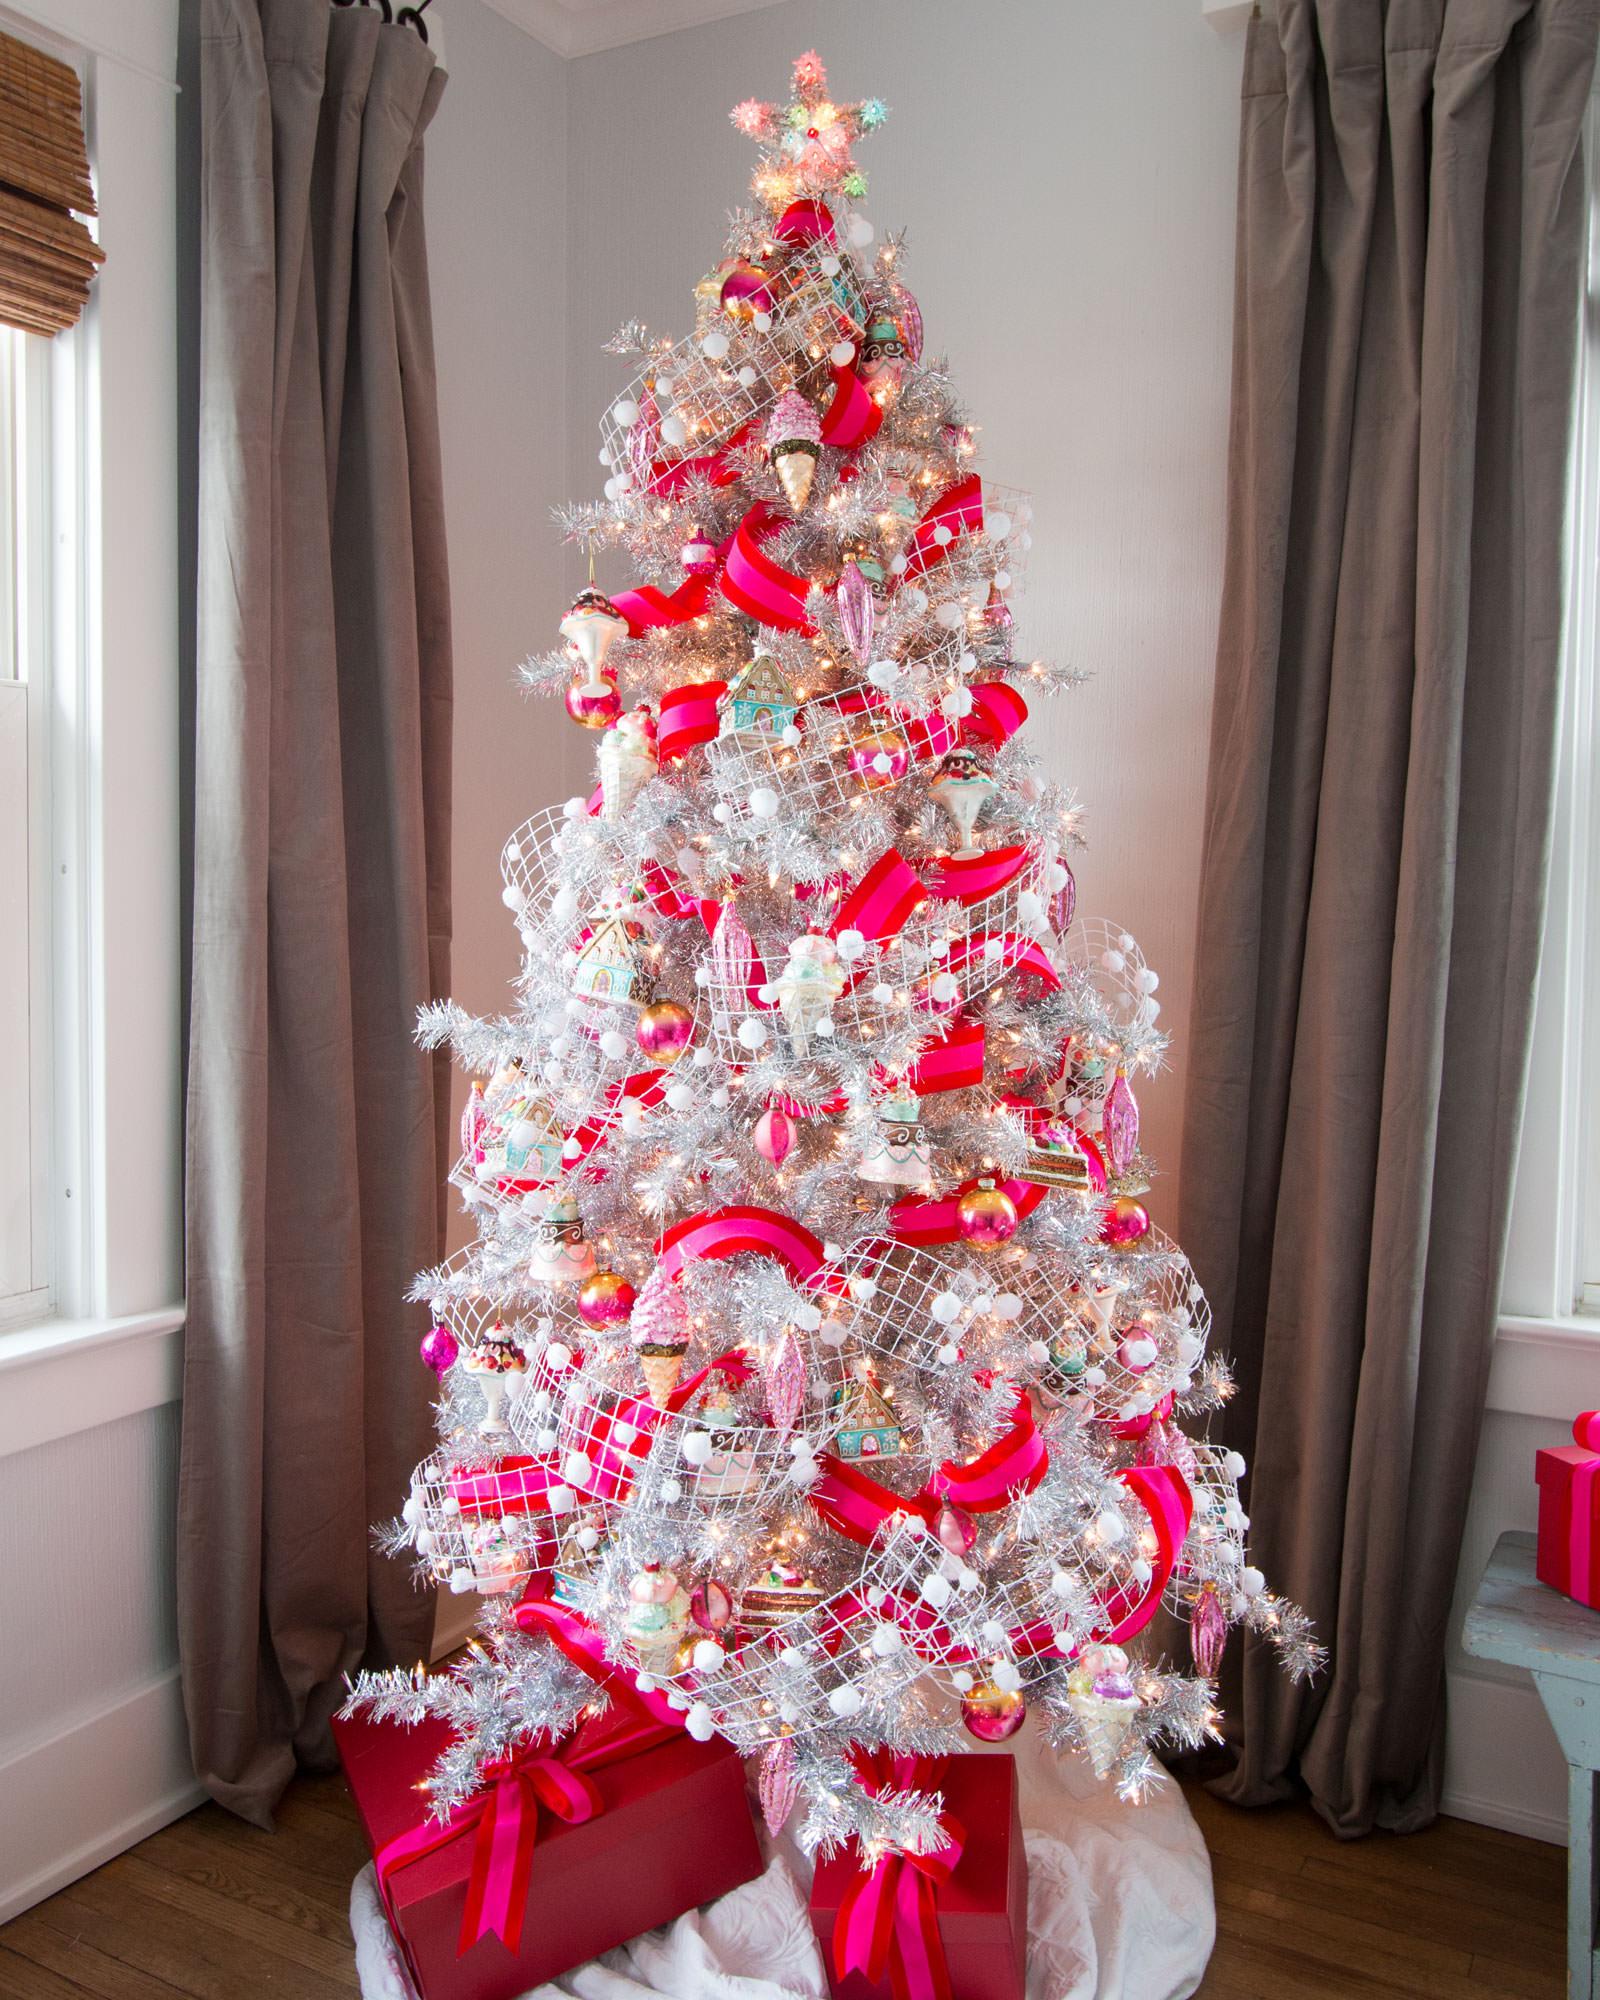 Tinkerbell Christmas Decorations Uk.Tinkerbell Silver Christmas Tree Treetopia Uk